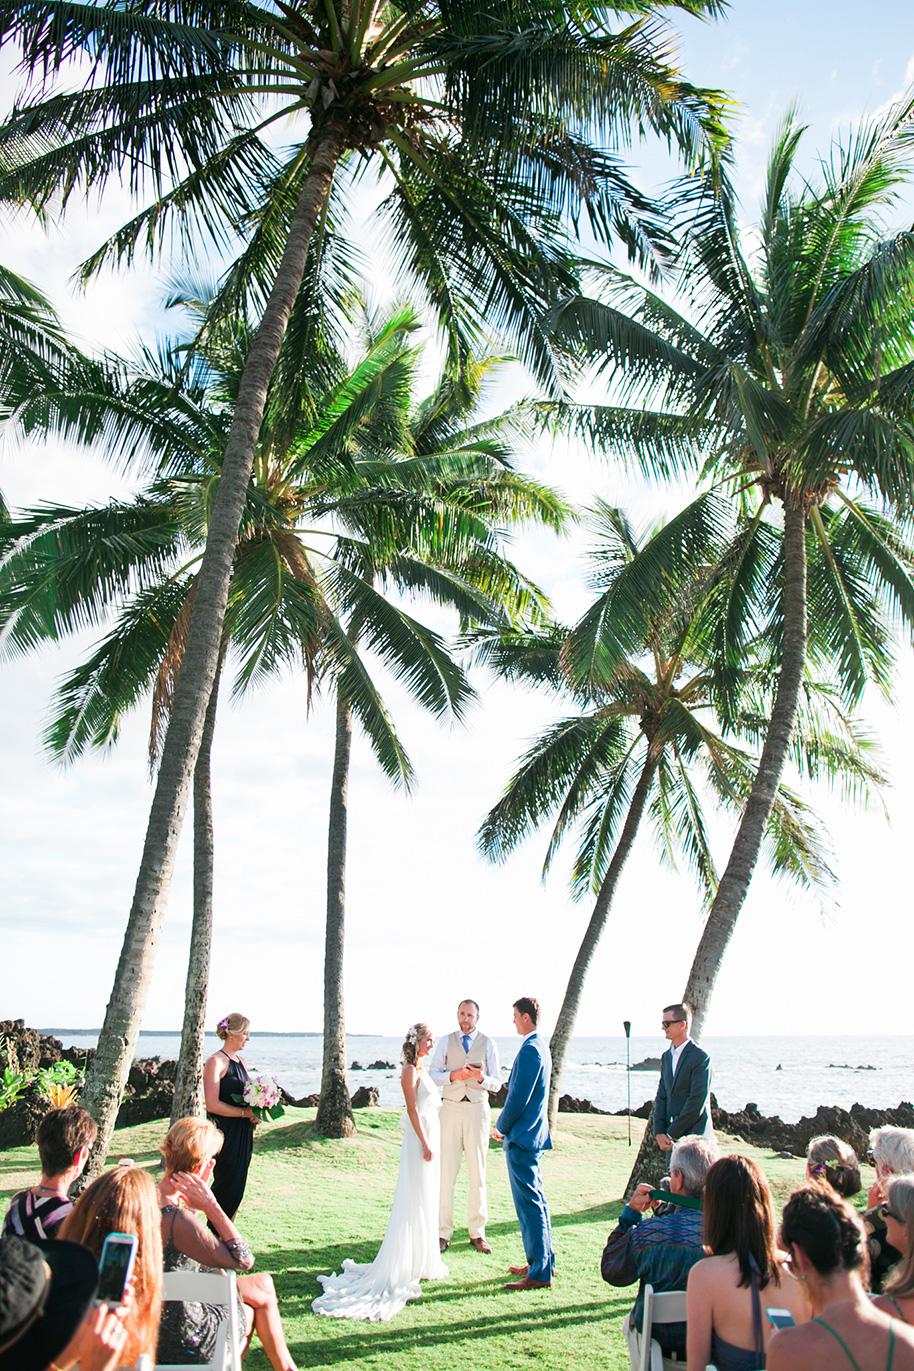 Maui-Wedding-060216-8